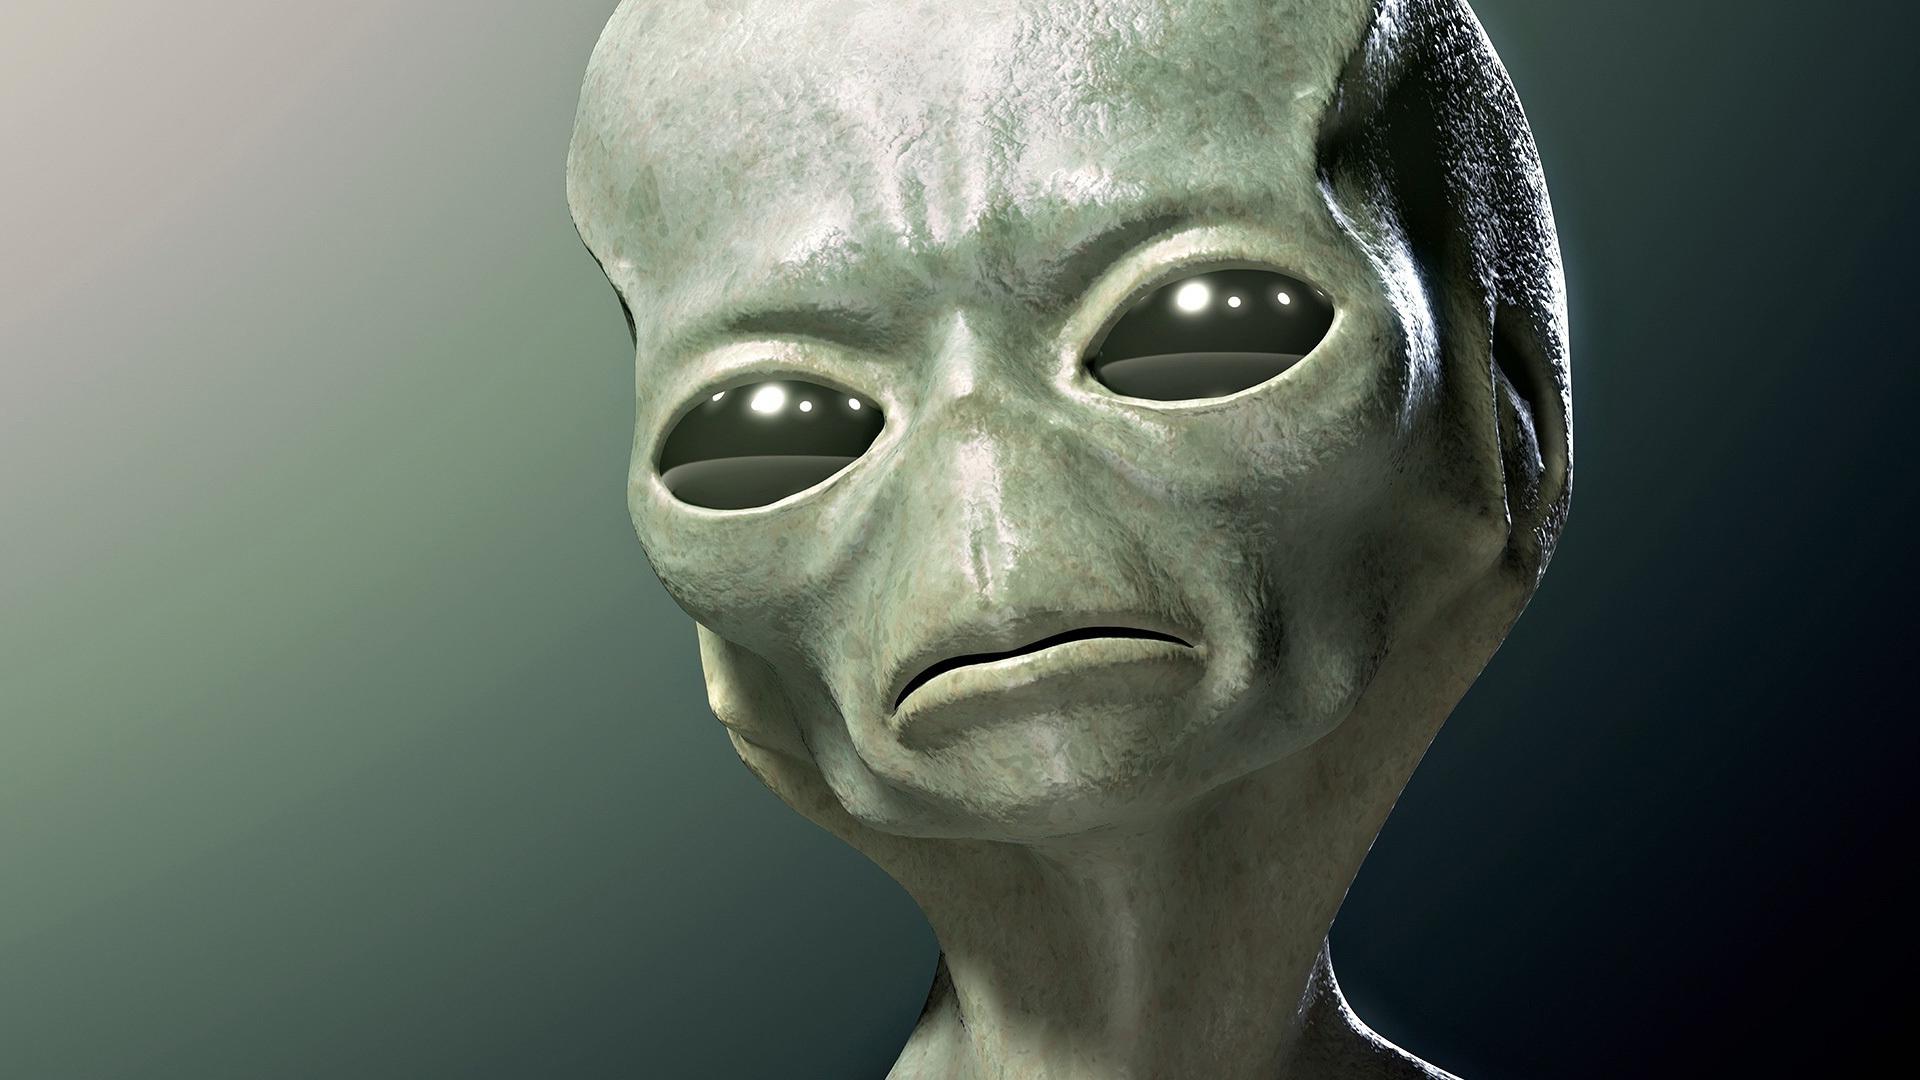 Movies__extraterrestrial_055270_.jpg